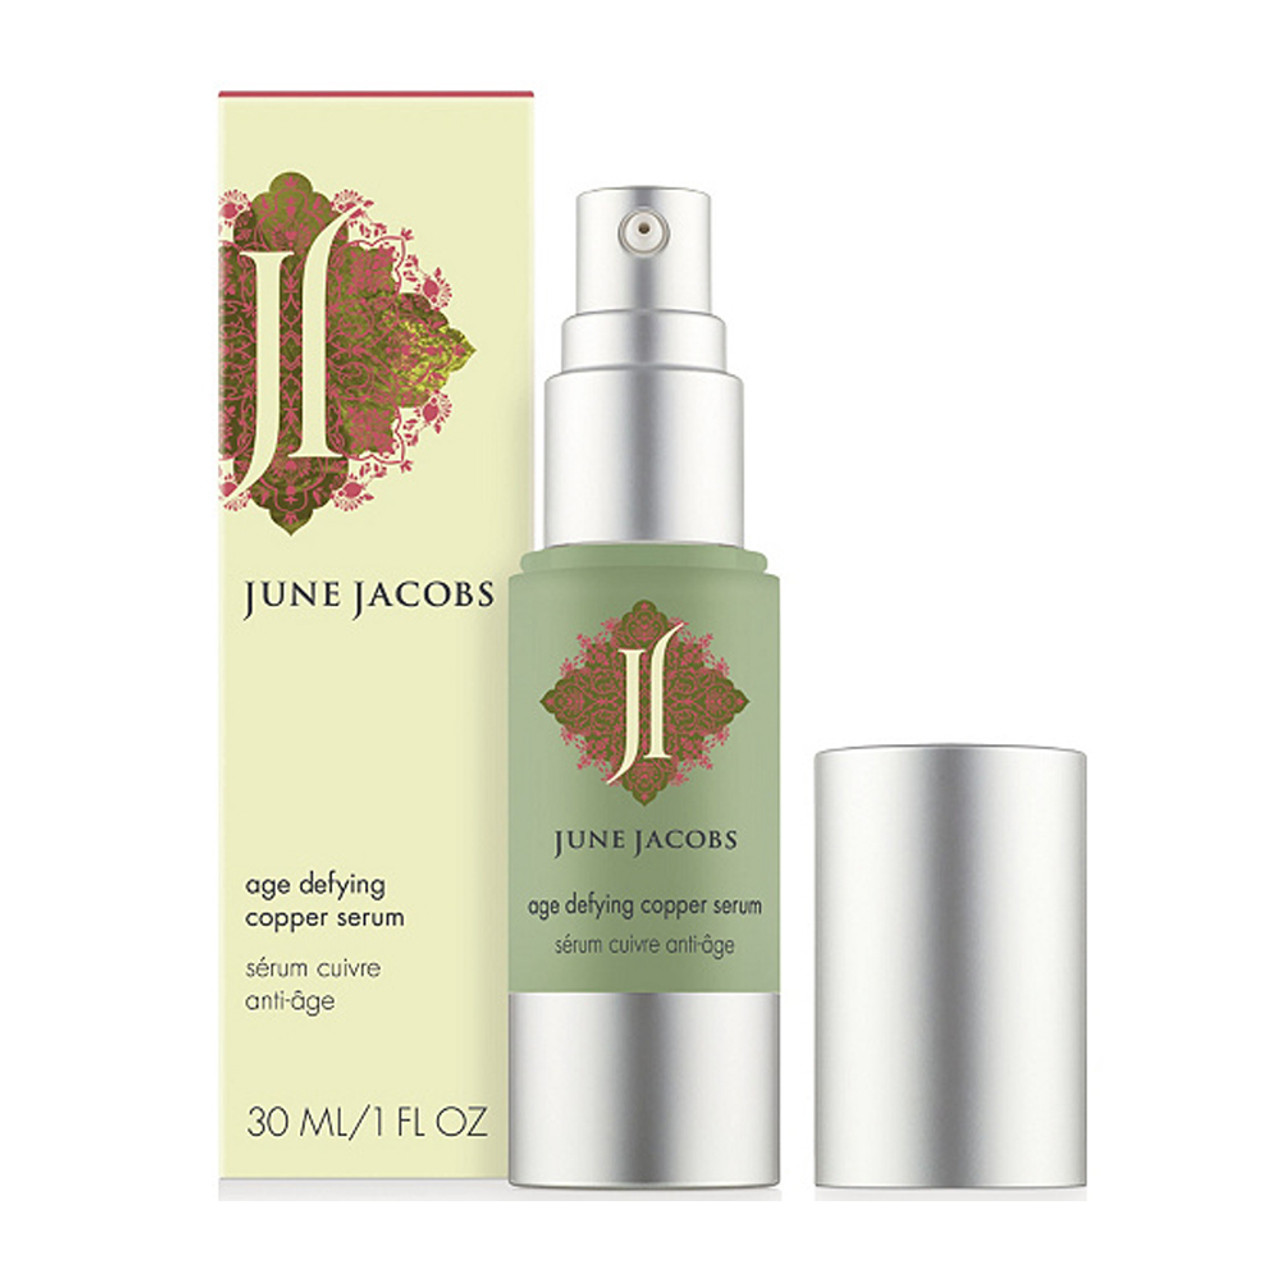 June Jacobs Age Defying Copper Serum BeautifiedYou.com